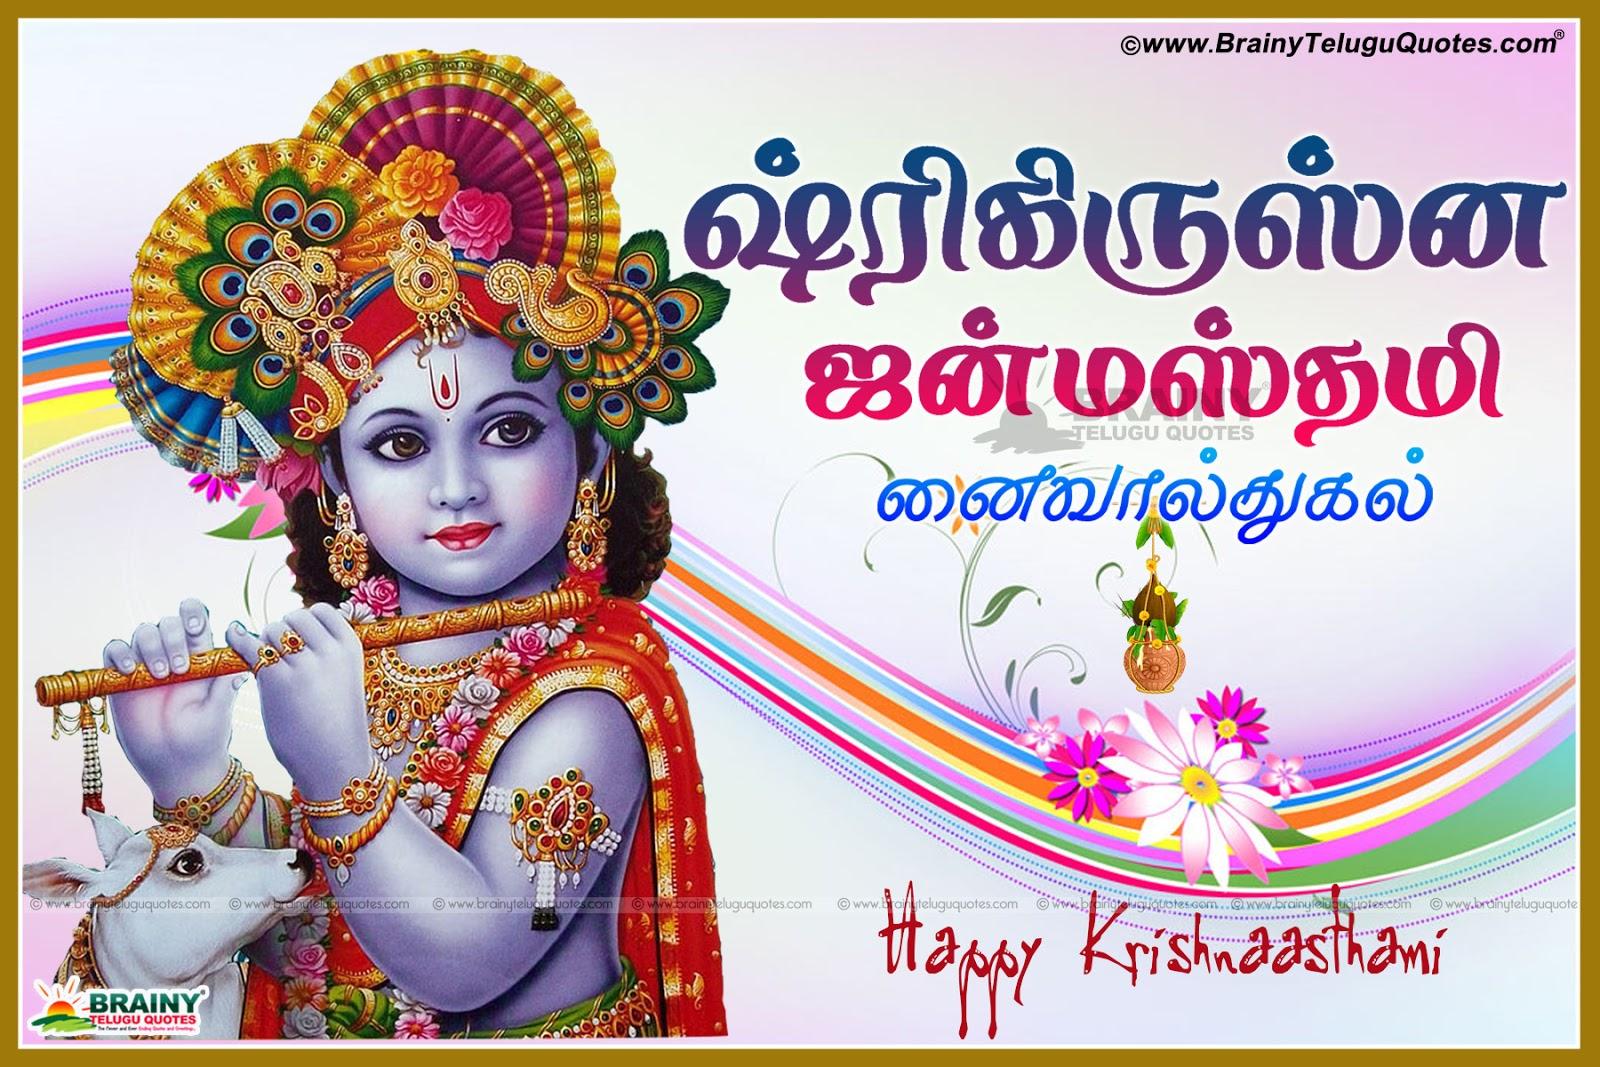 Lord Krishna Quotes Latest Tamil Kavithai Quotes On Sri Krishna Janmashtami With Nice